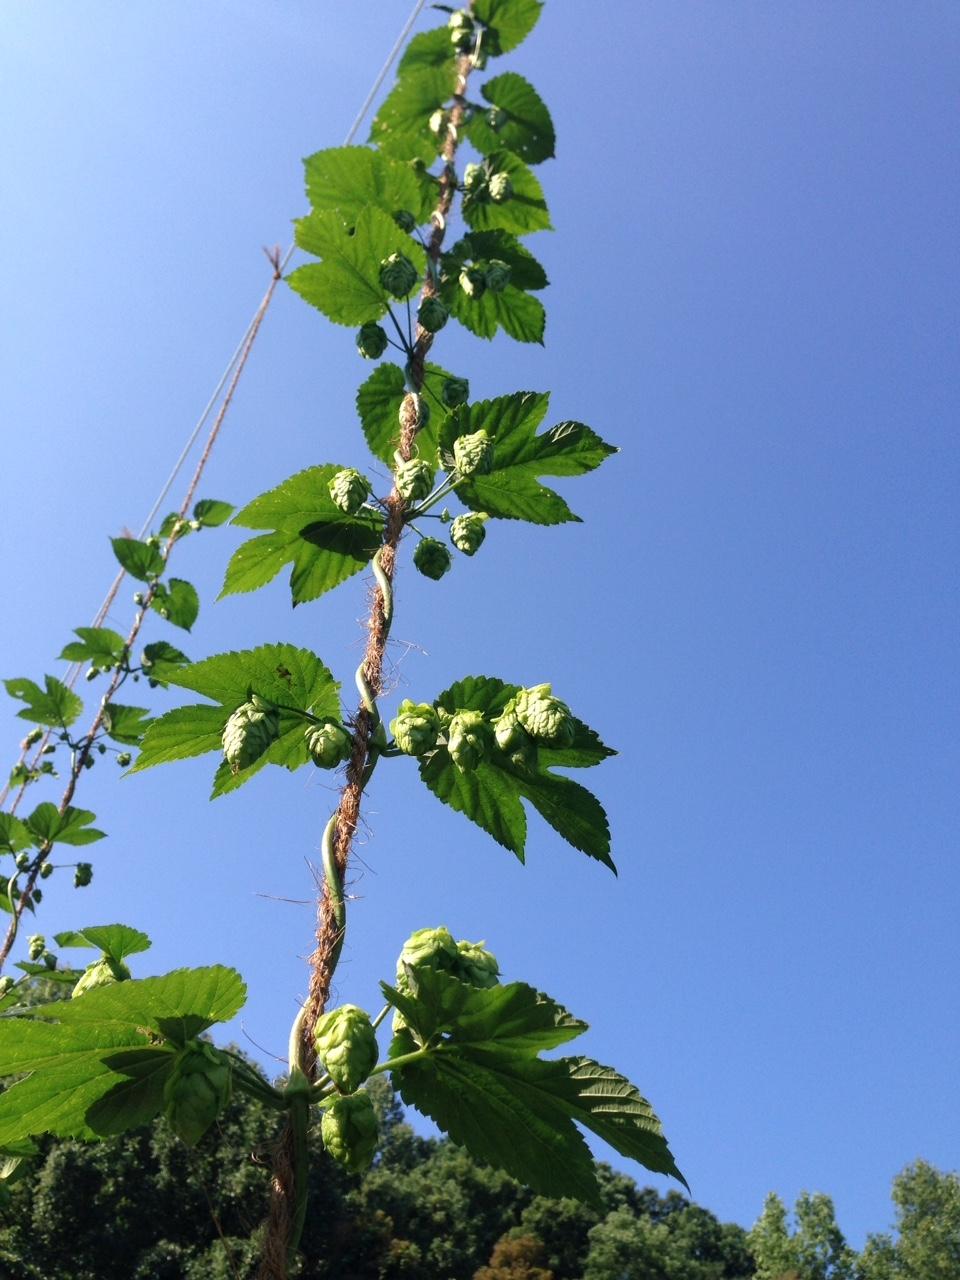 Hops reach for the sky